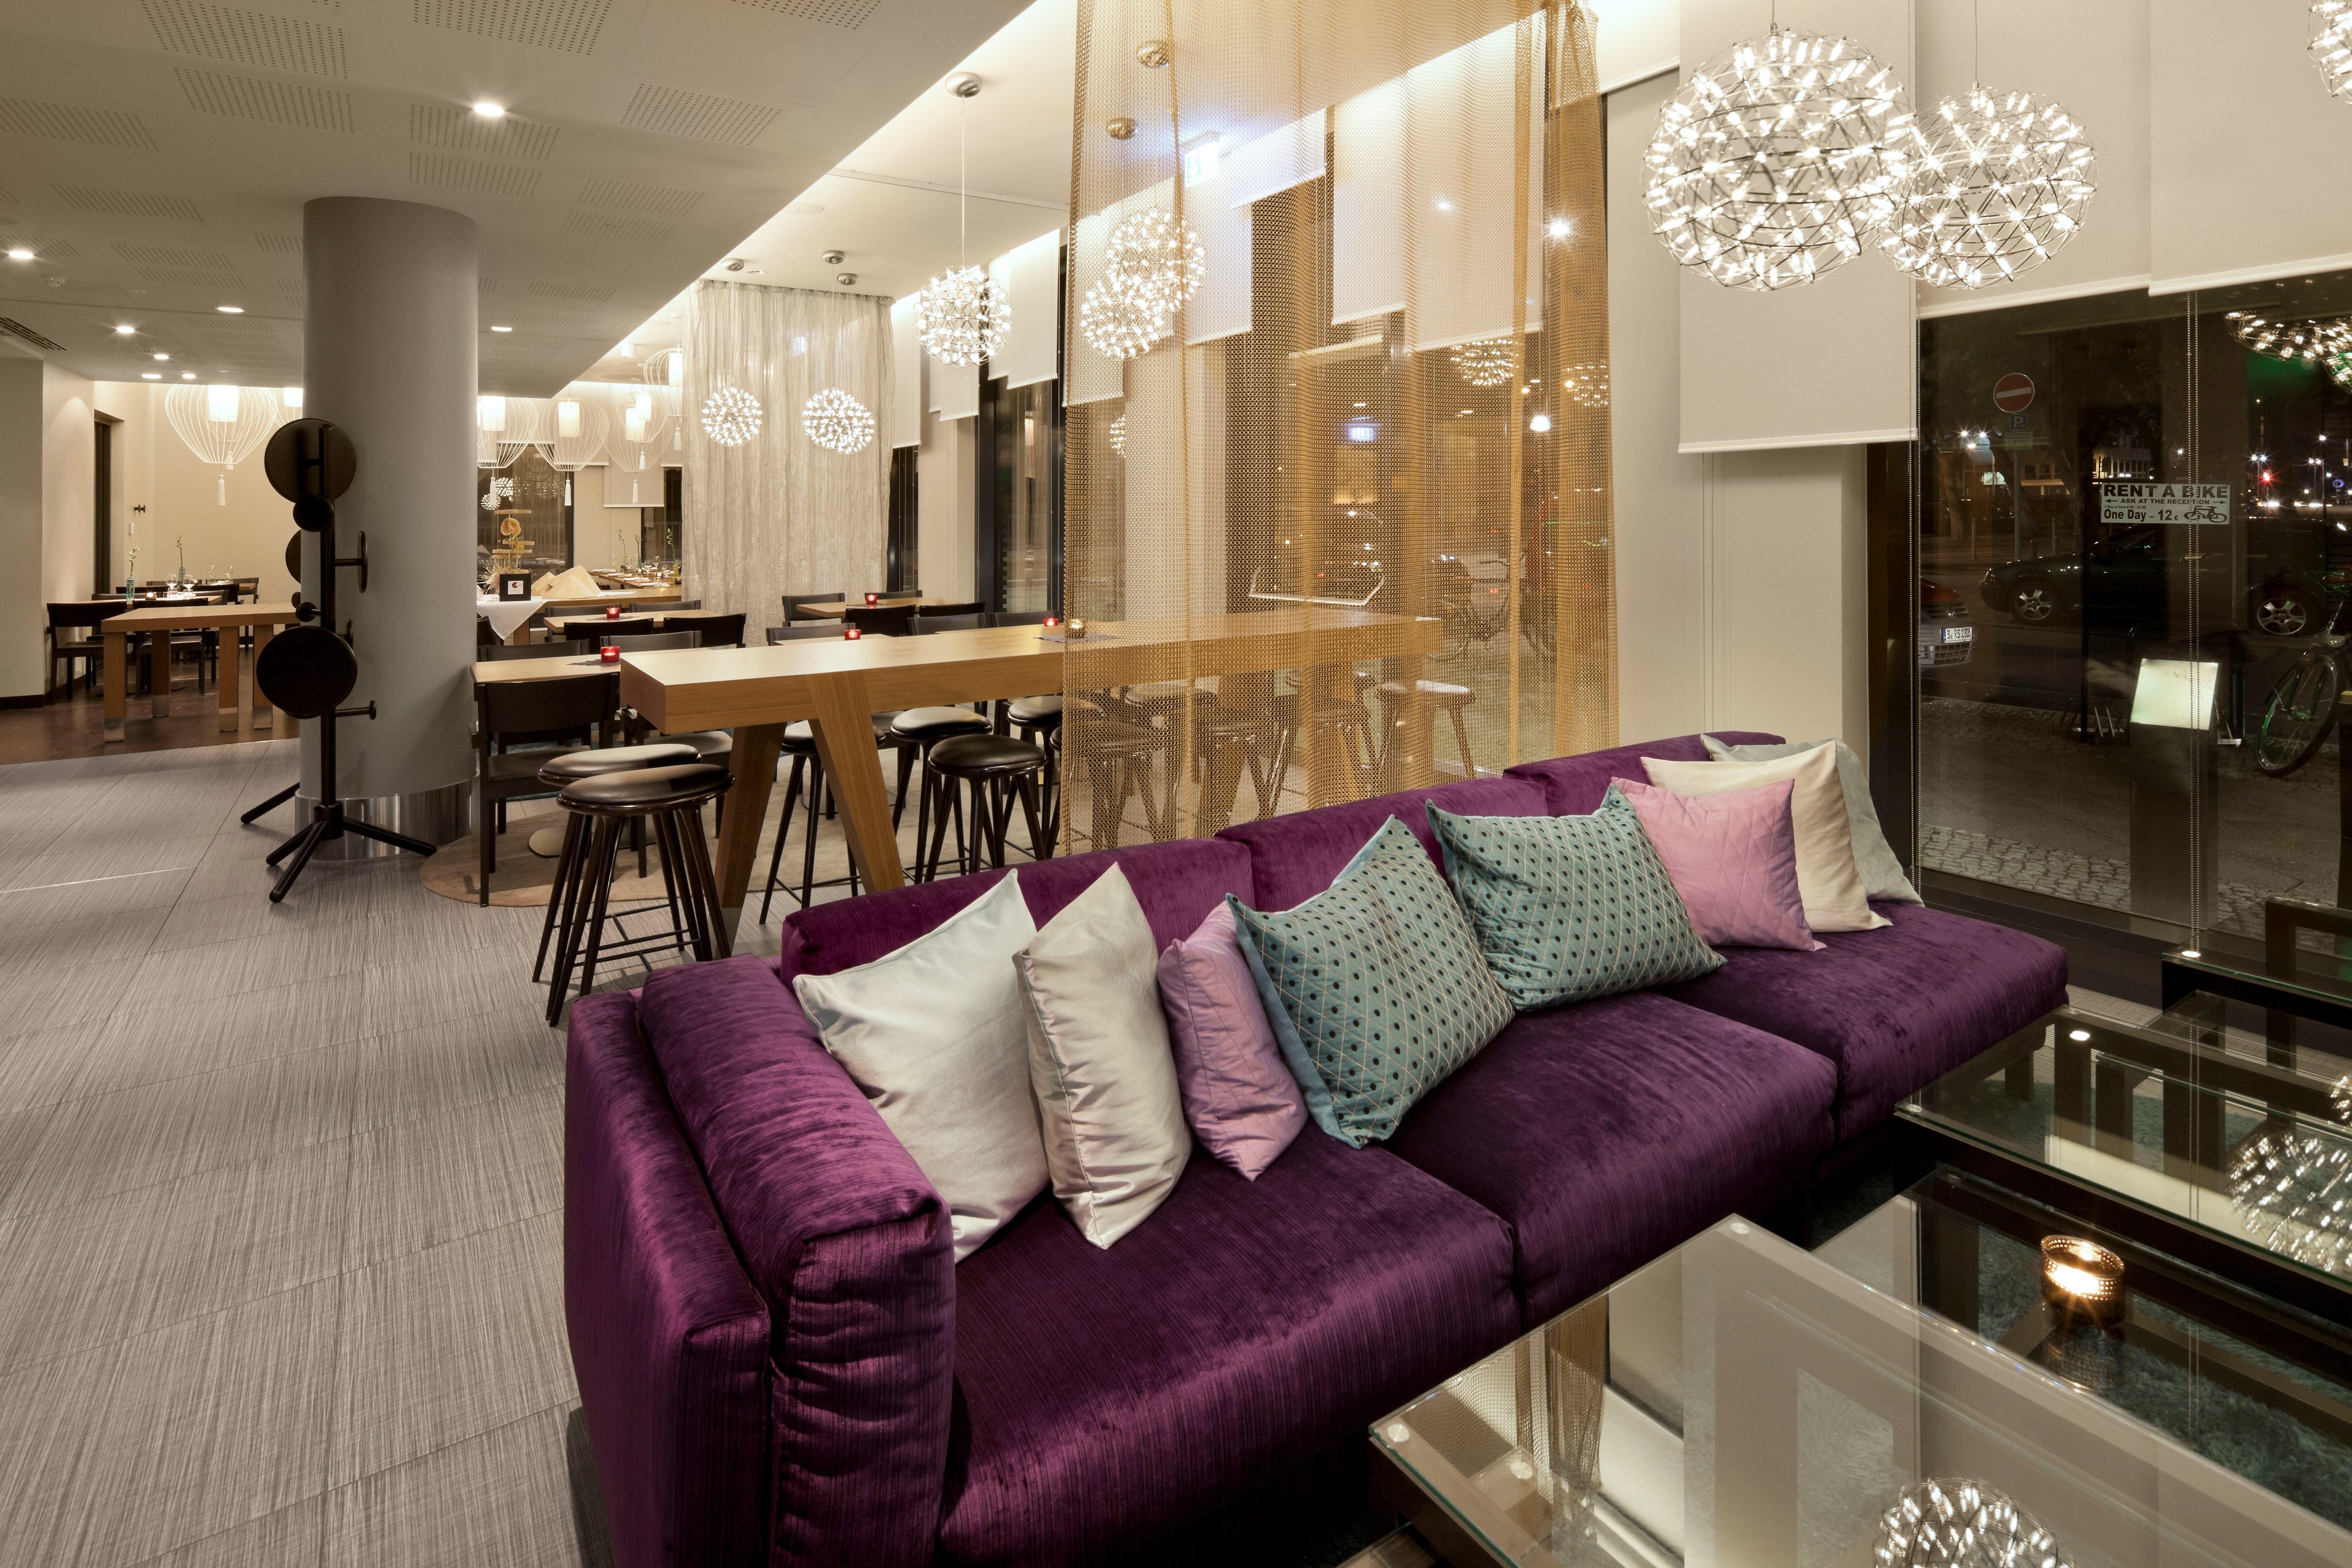 Jordan Alexander Interior Design Furniture ~ Cheap ville maison proprit salon meubles chambre moderne